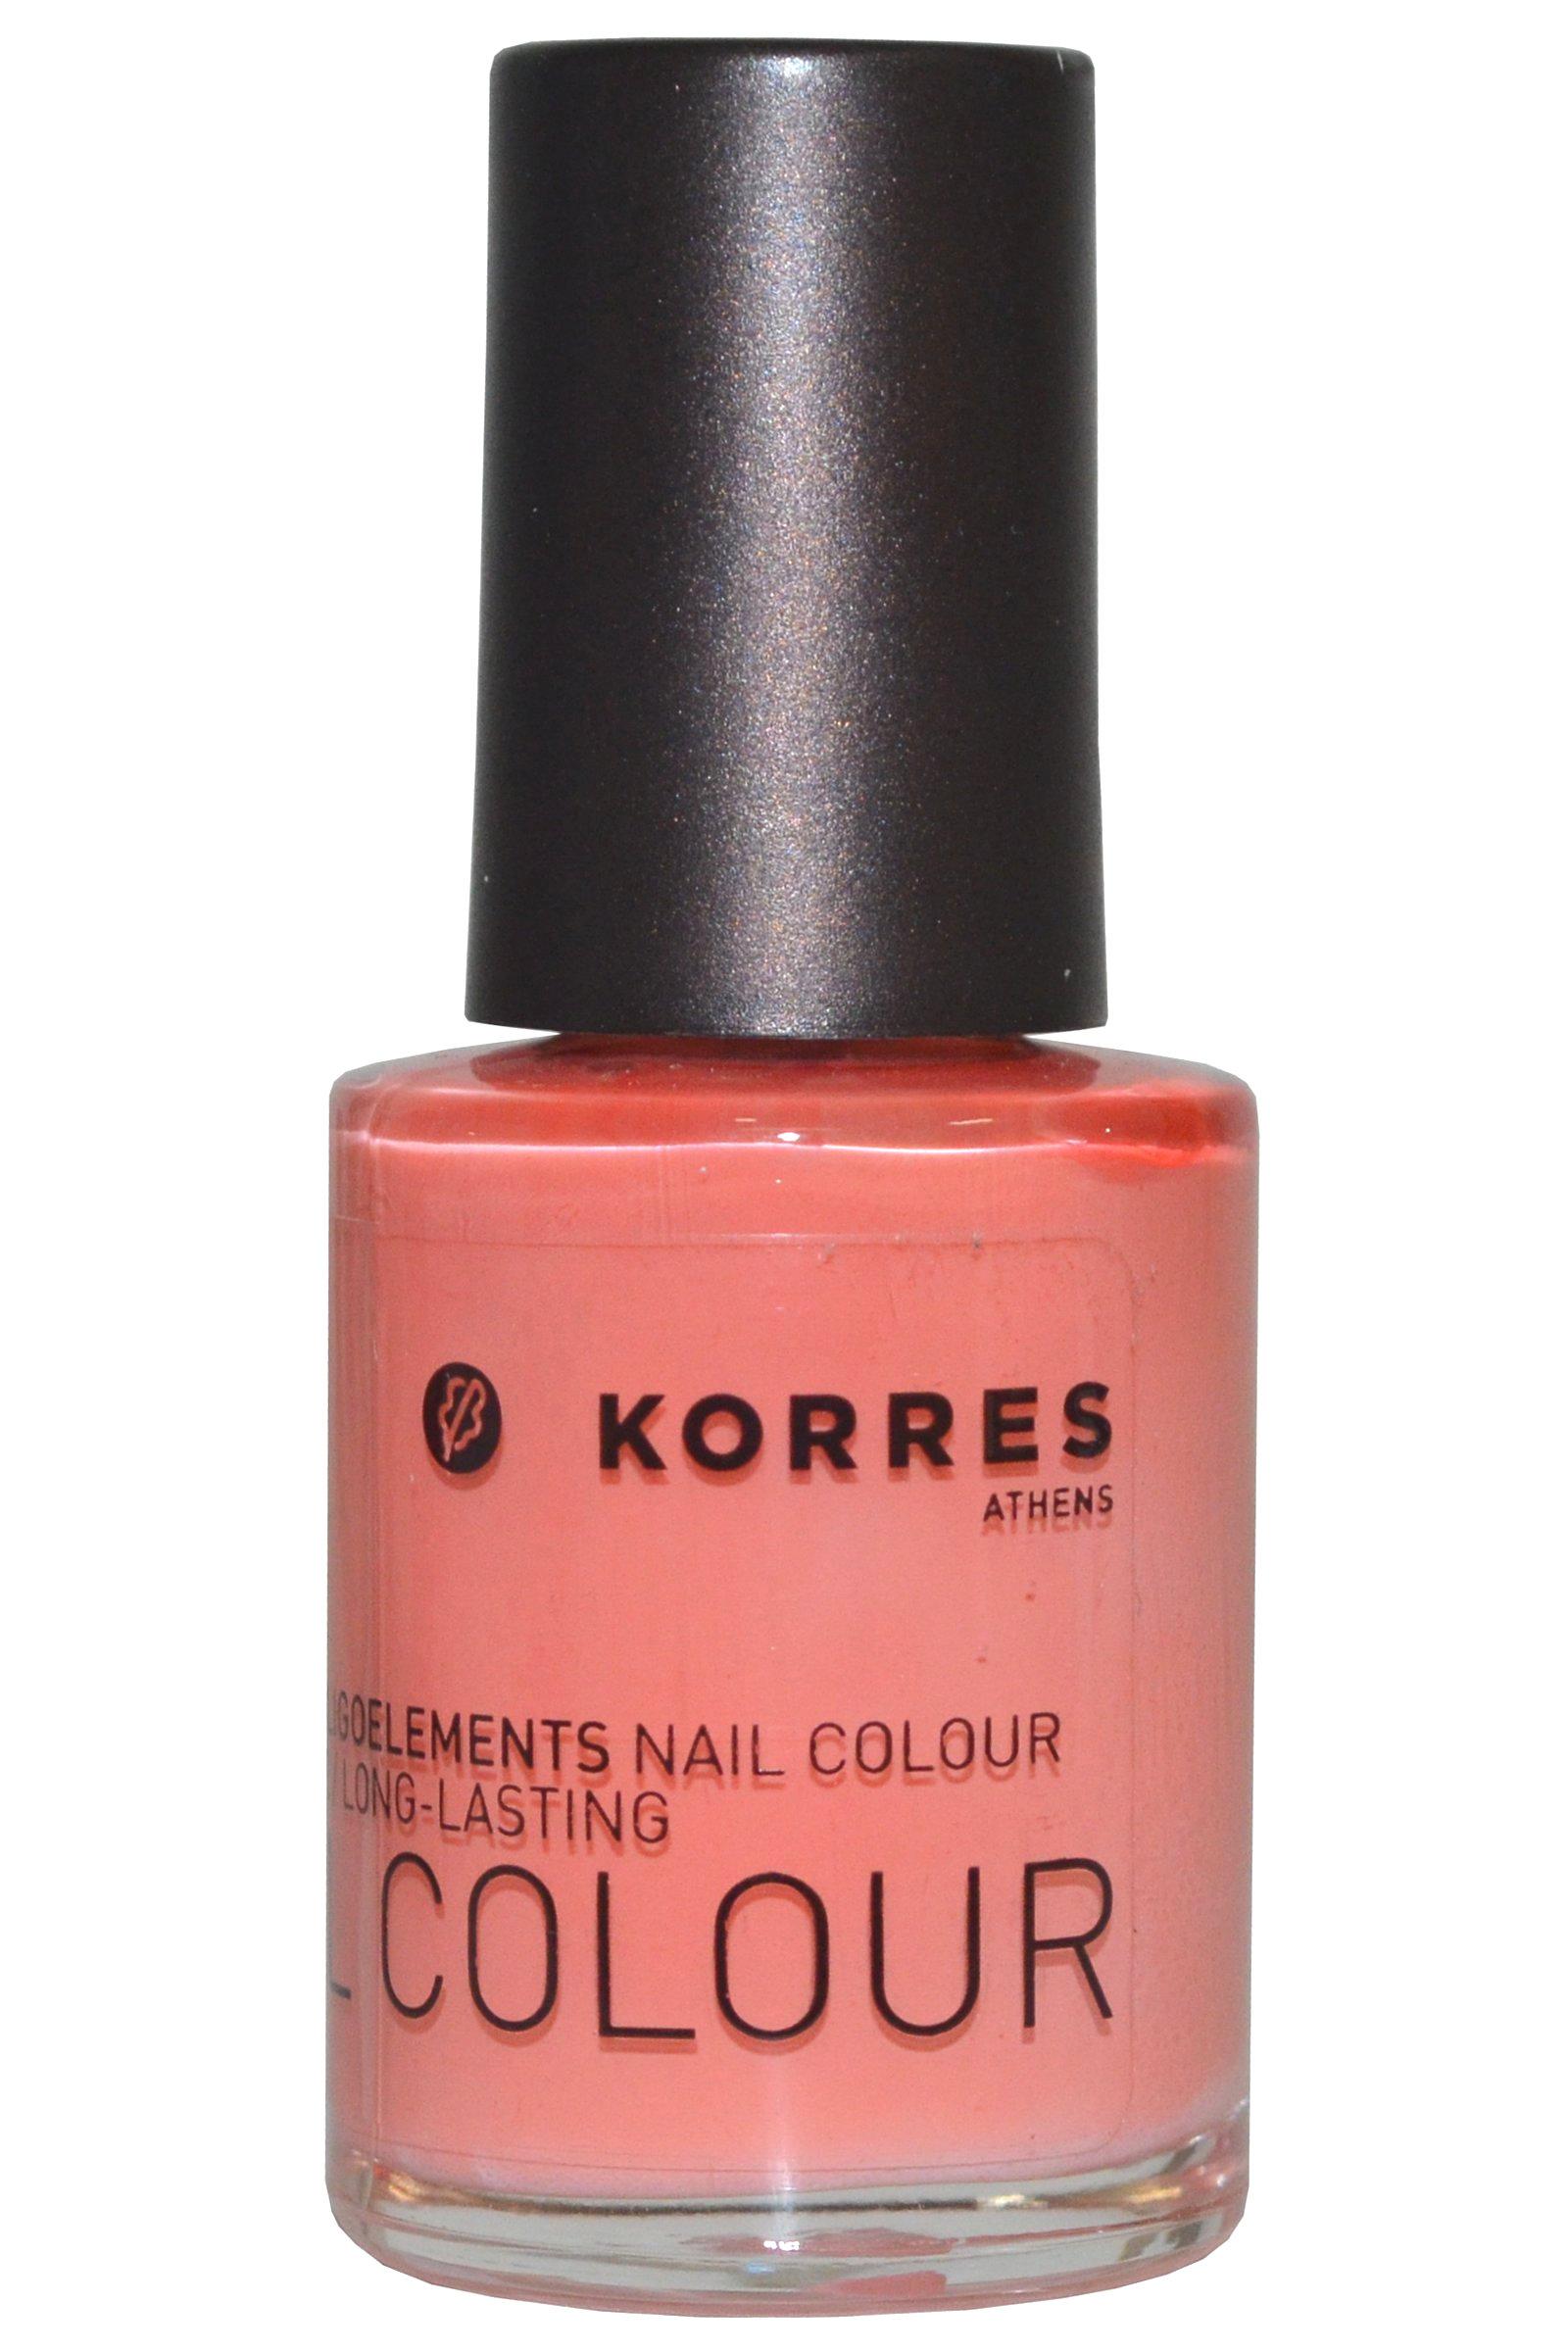 Korres Nail Color High Shine Long Lasting 10ml Mango Sorbet (#42) [Free From 7]